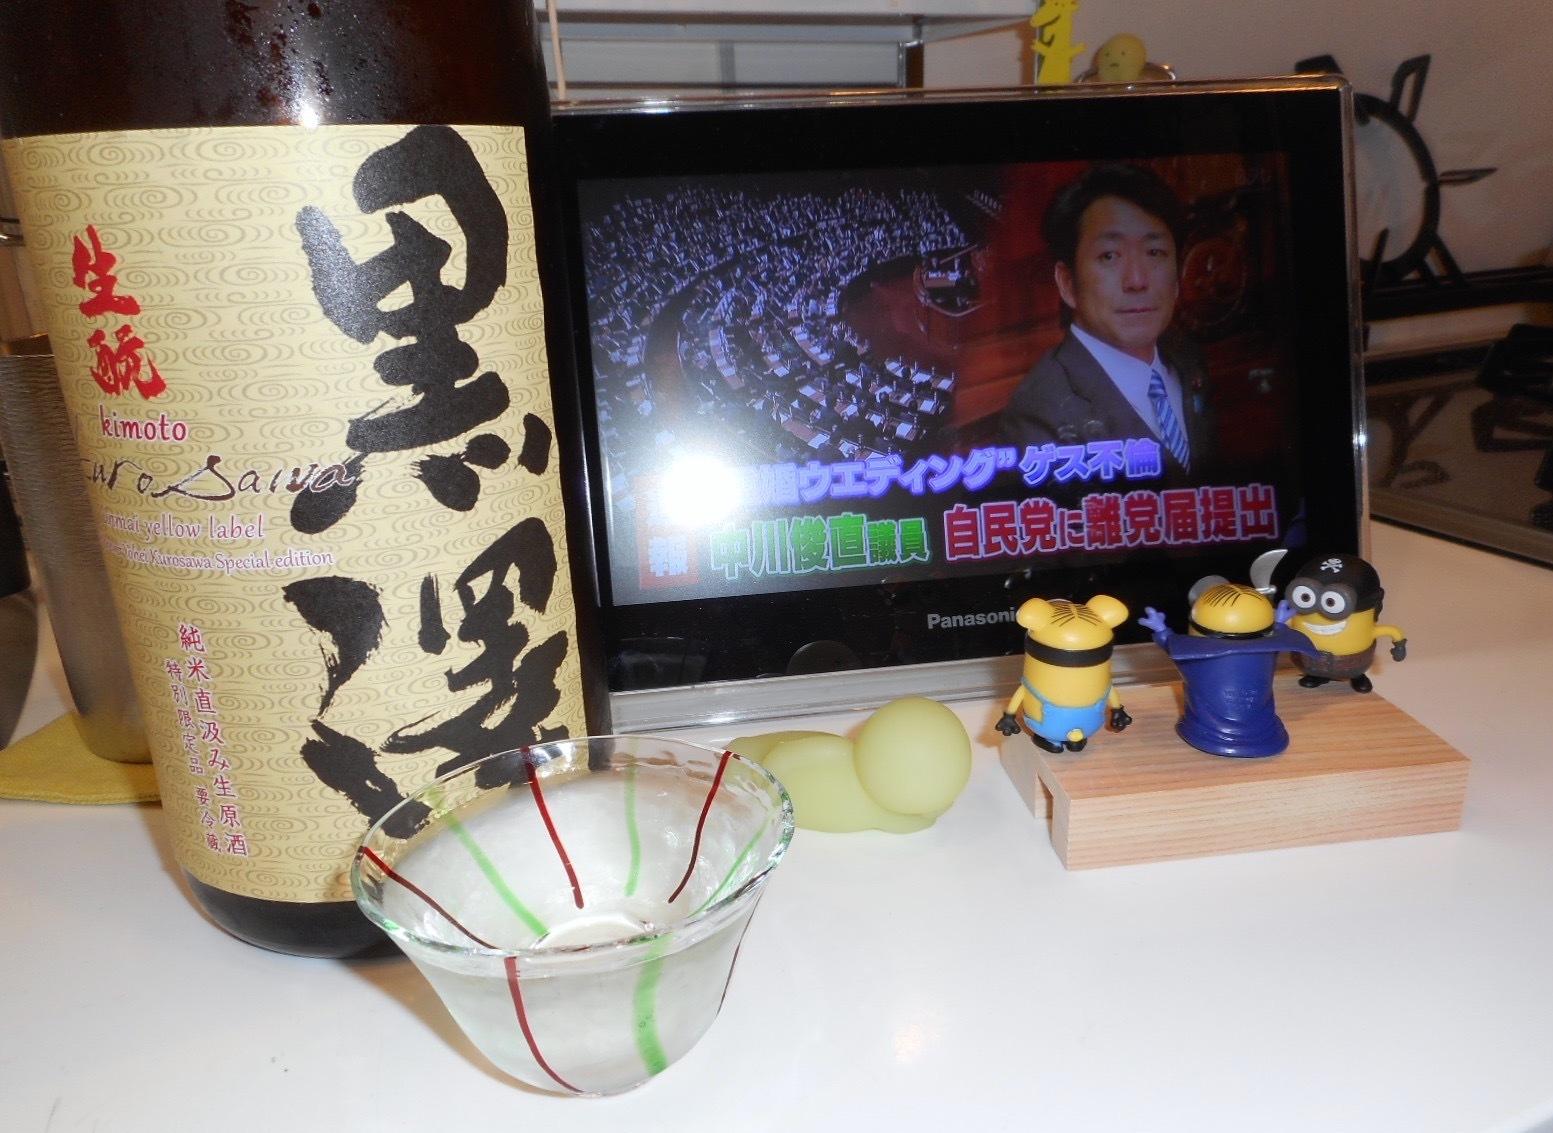 kurosawa_jikagumi_yellow28by9.jpg